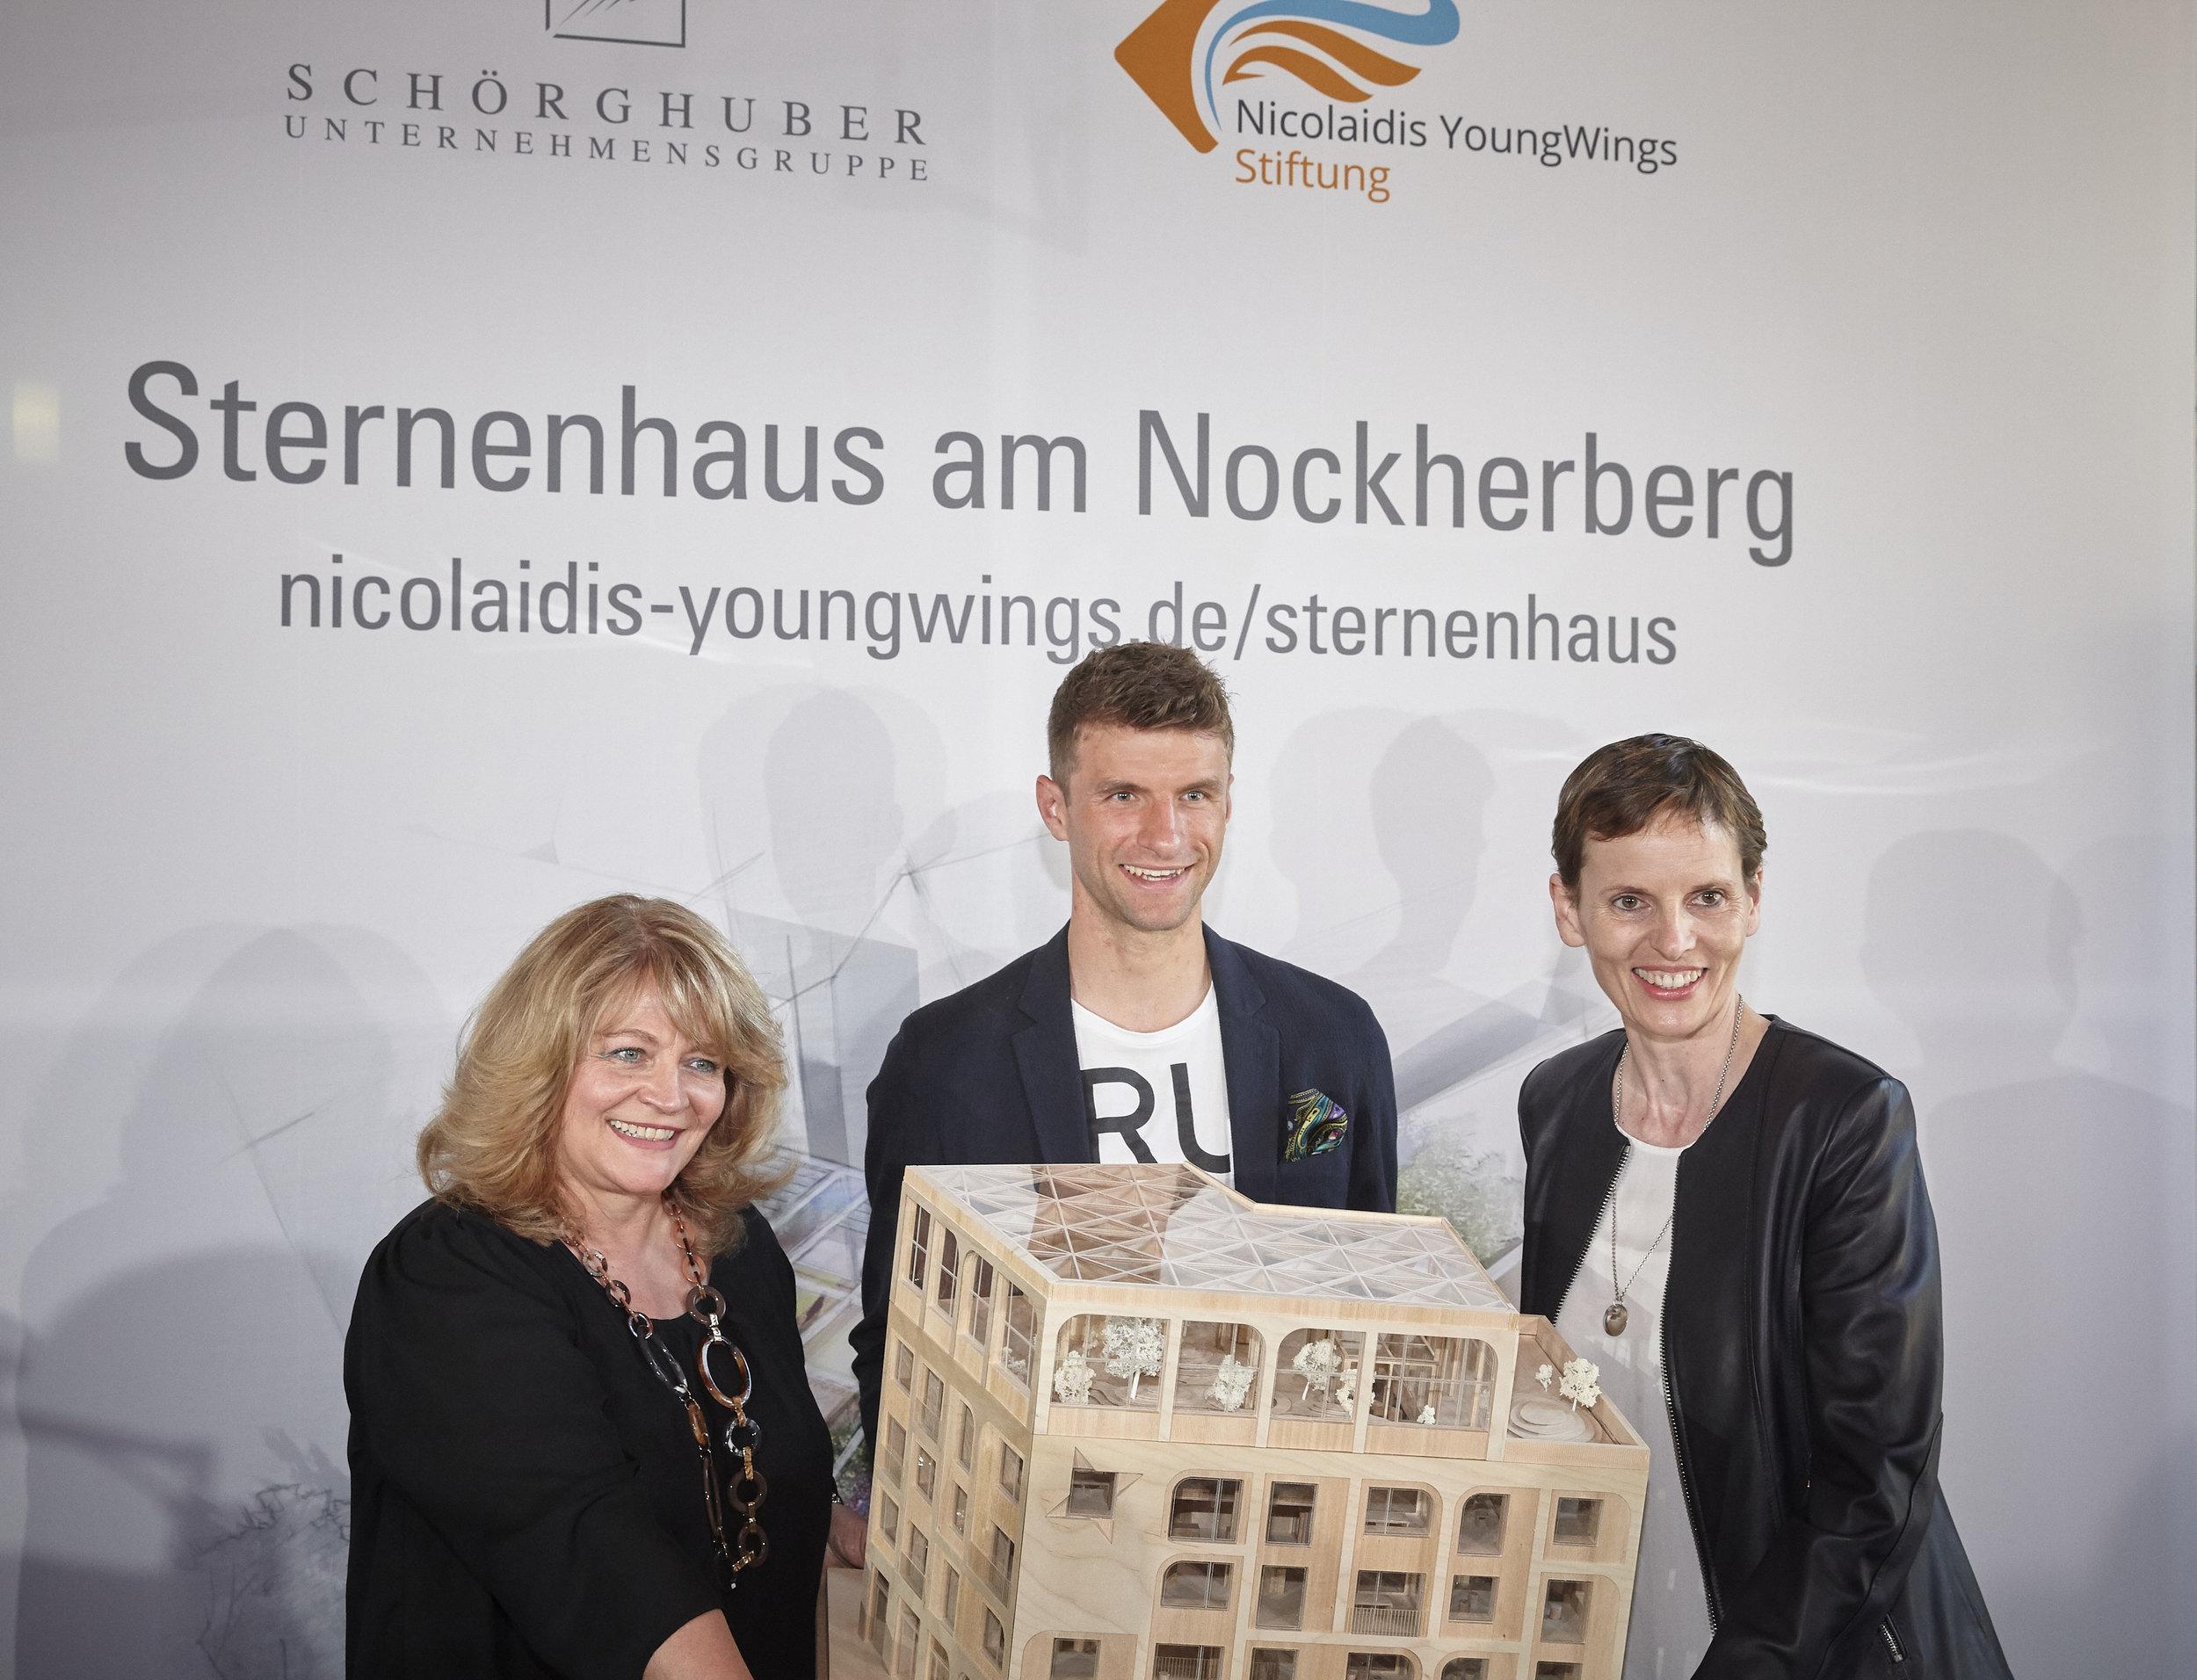 PK-Sternenhaus_A.Schorghuber_M.Muench-N icolaidis_T.Mueller.jpg